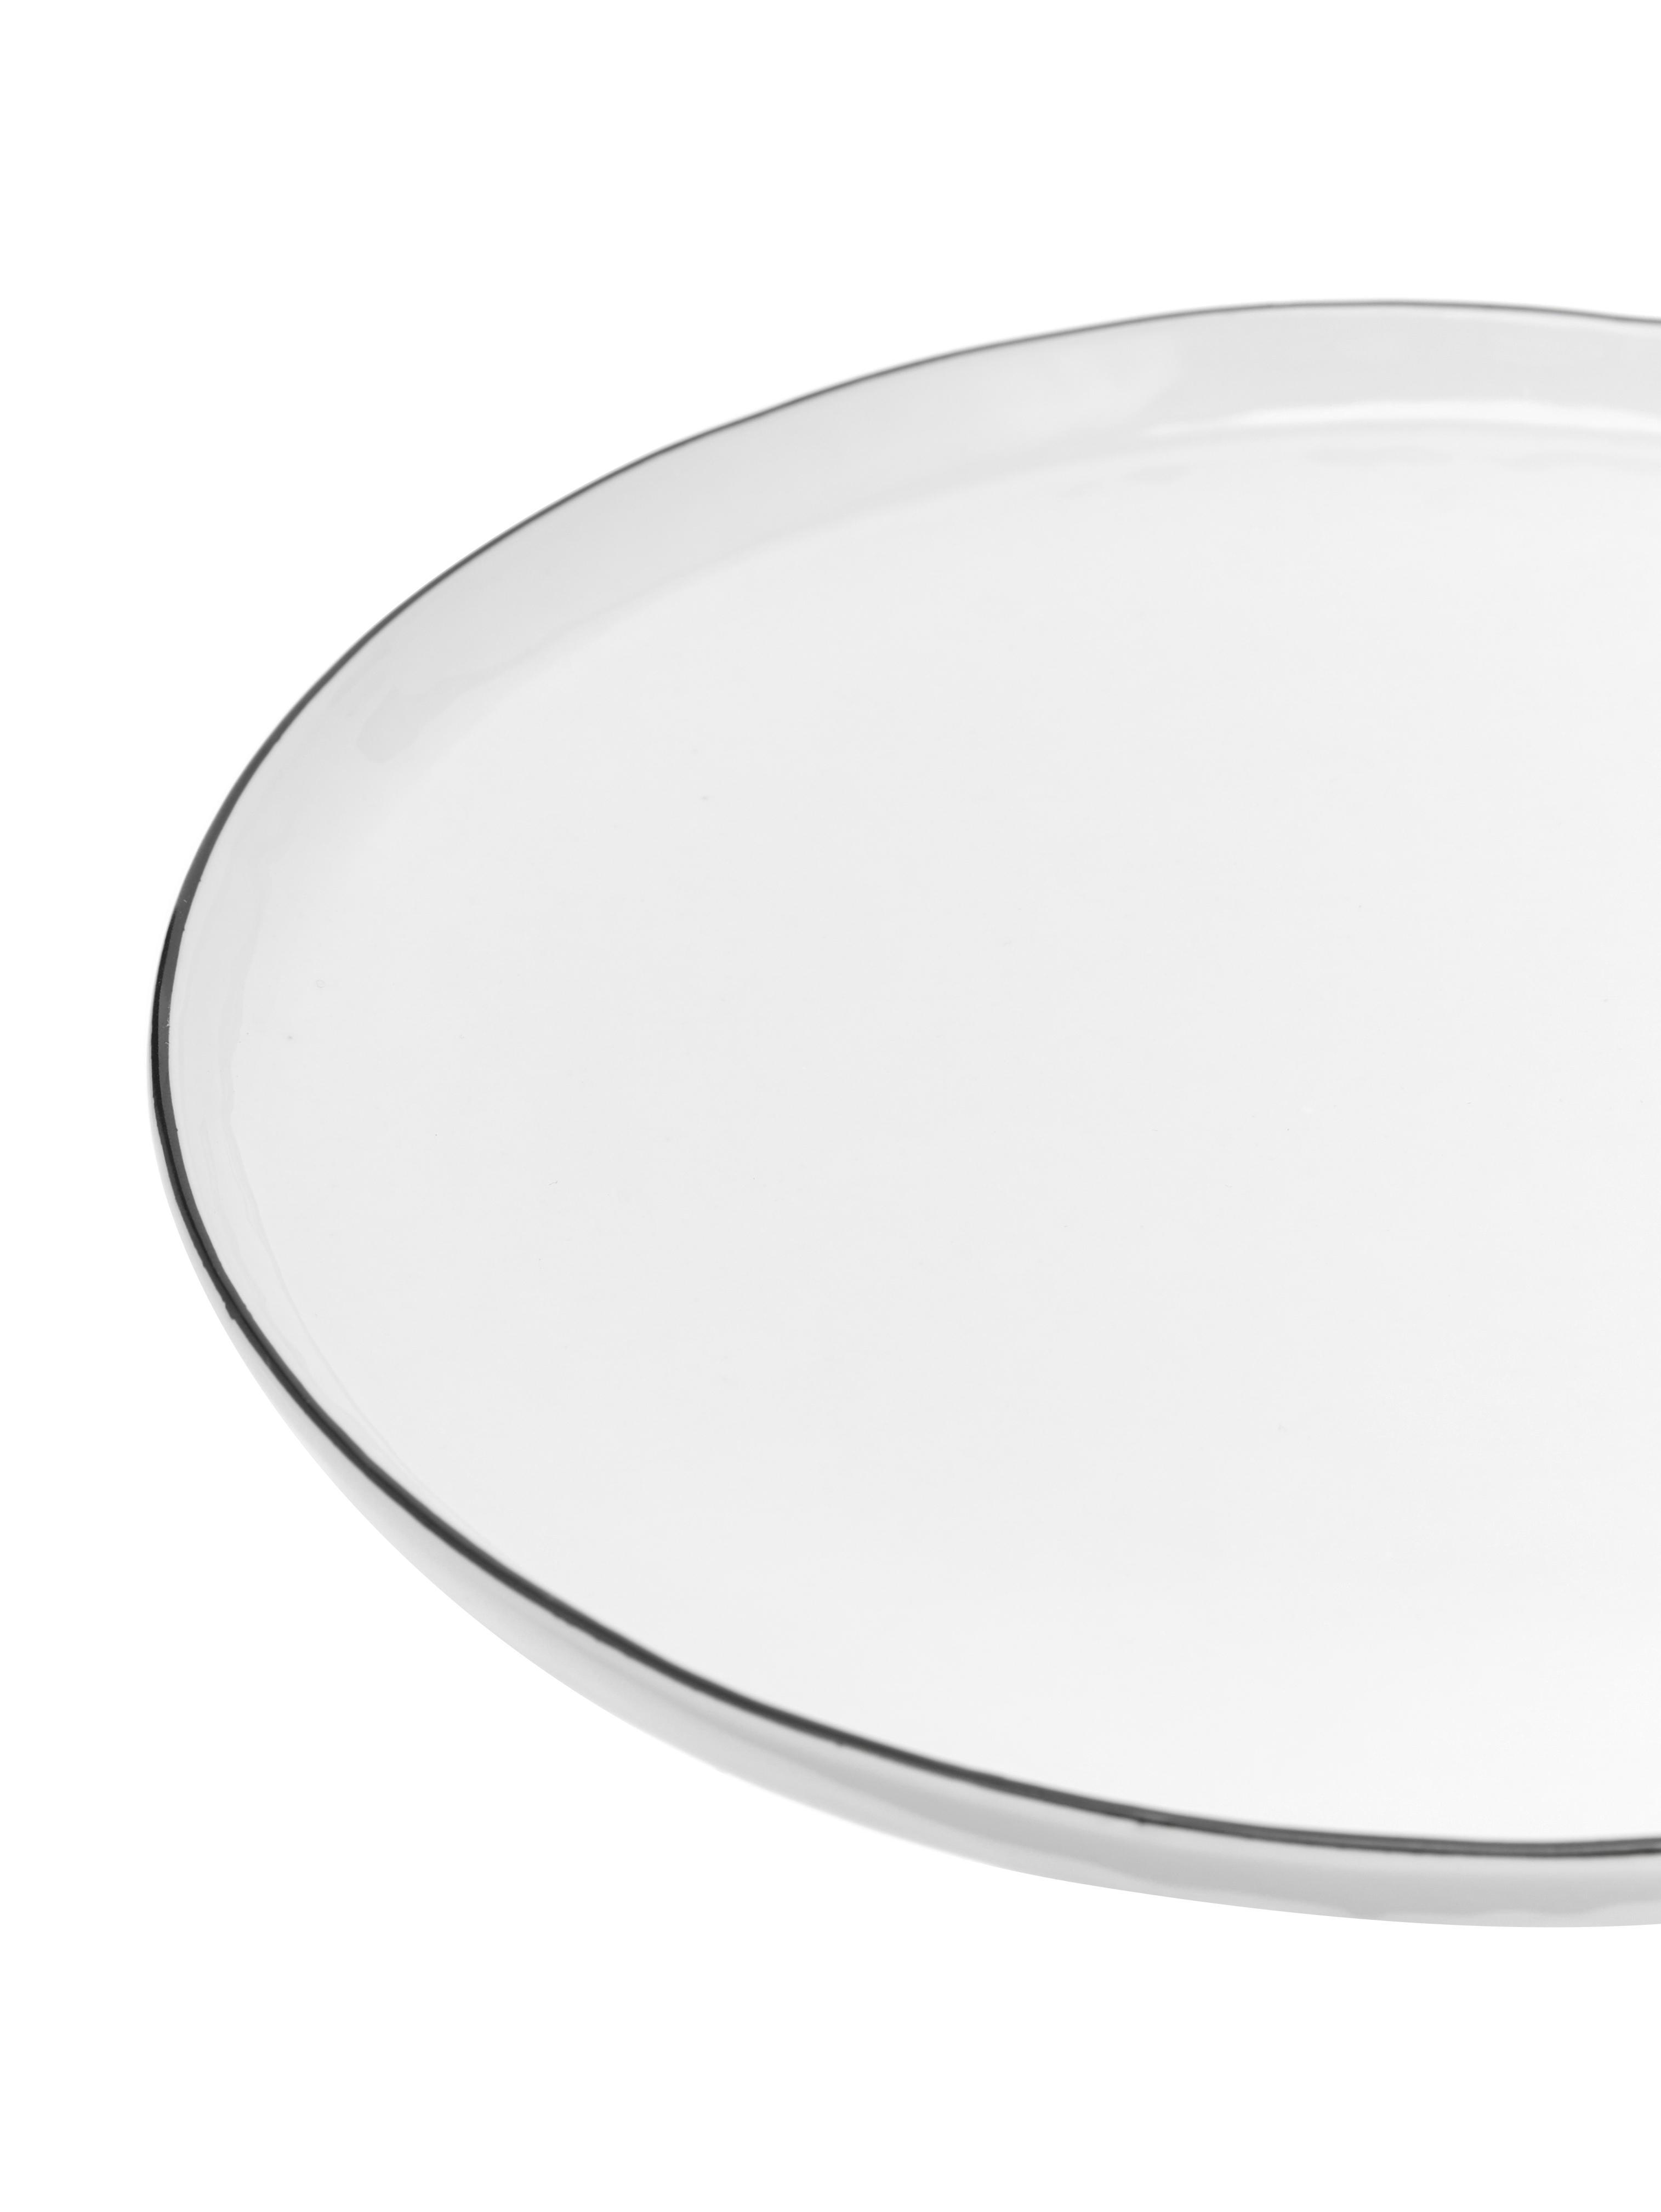 Piattino da dessert fatto a mano Salt 4 pz, Porcellana, Bianco latteo, nero, Ø 22 cm